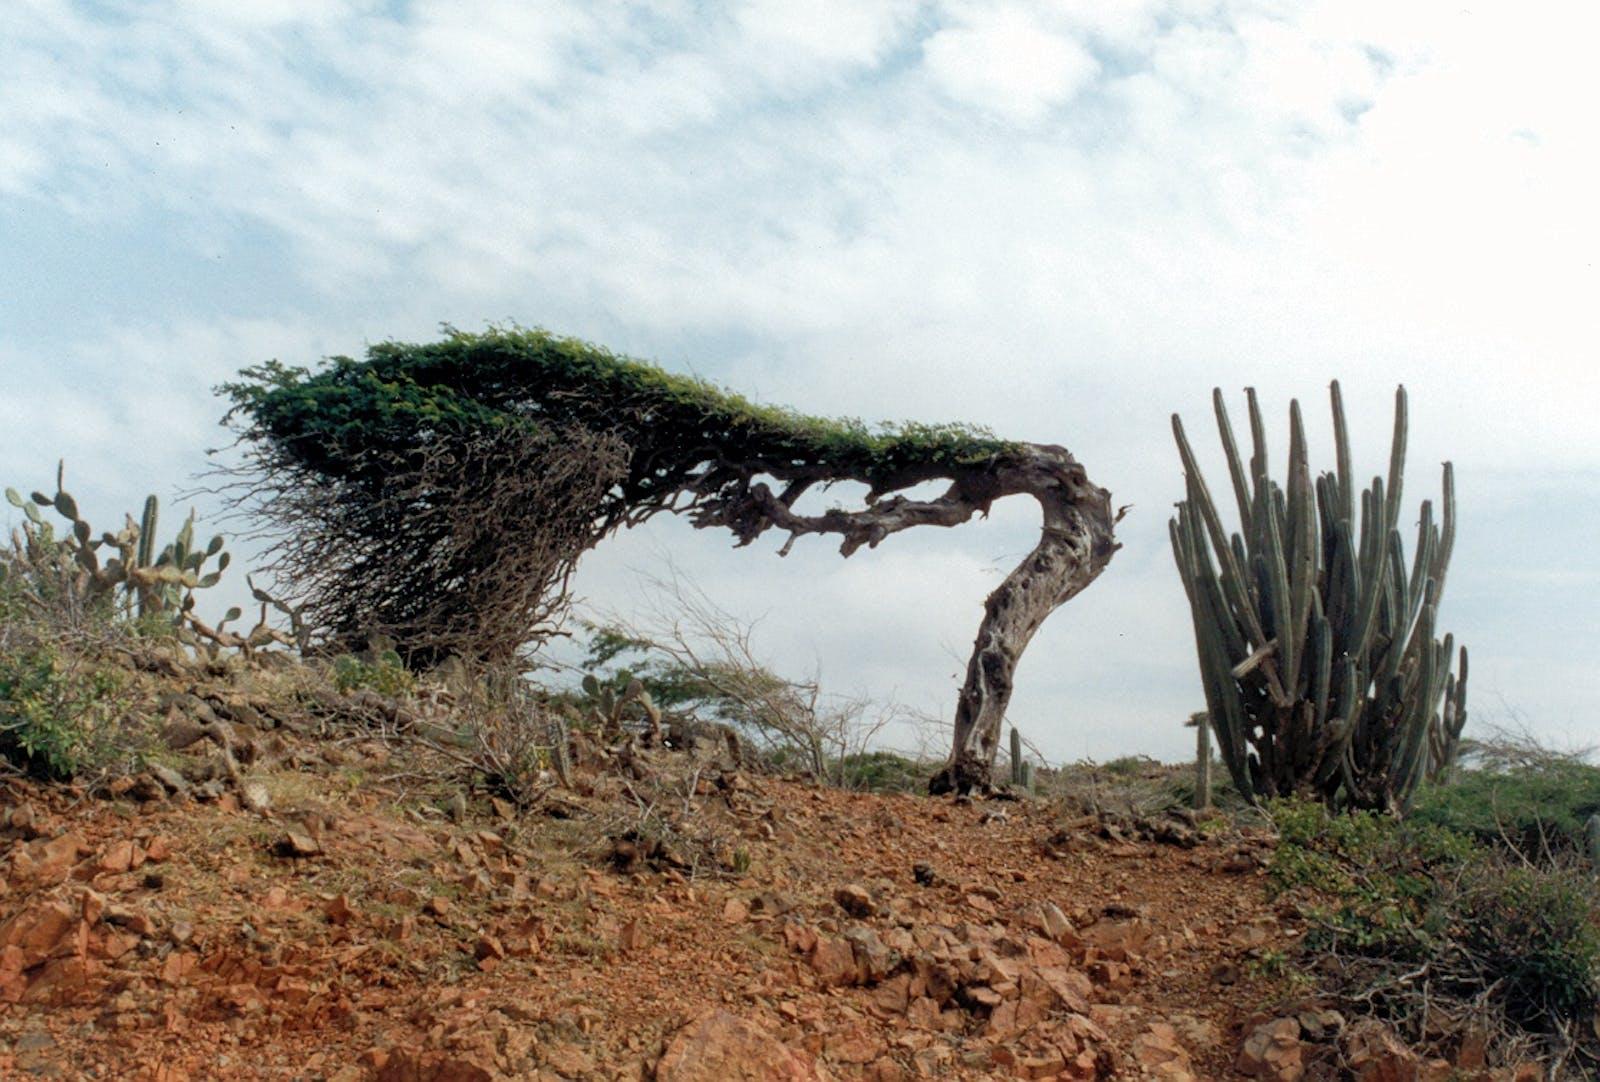 Guajira-Barranquilla Xeric Scrub